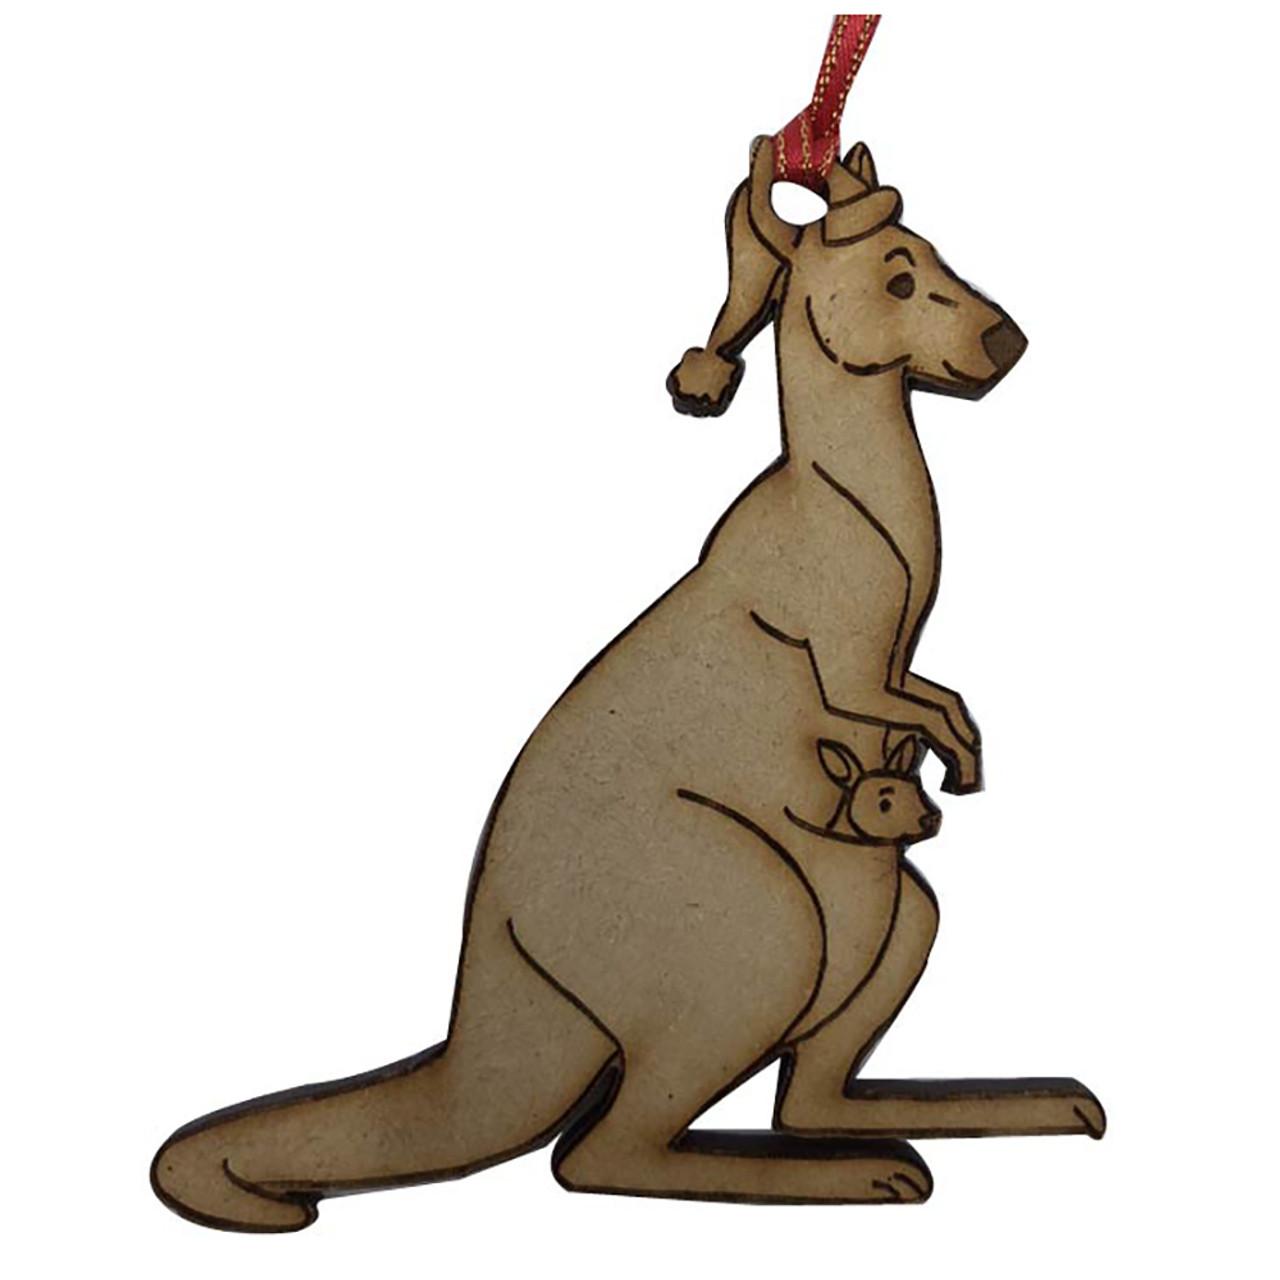 Christmas Kangaroo Cartoon.Laser Cut Christmas Kangaroo Hanging Decoration